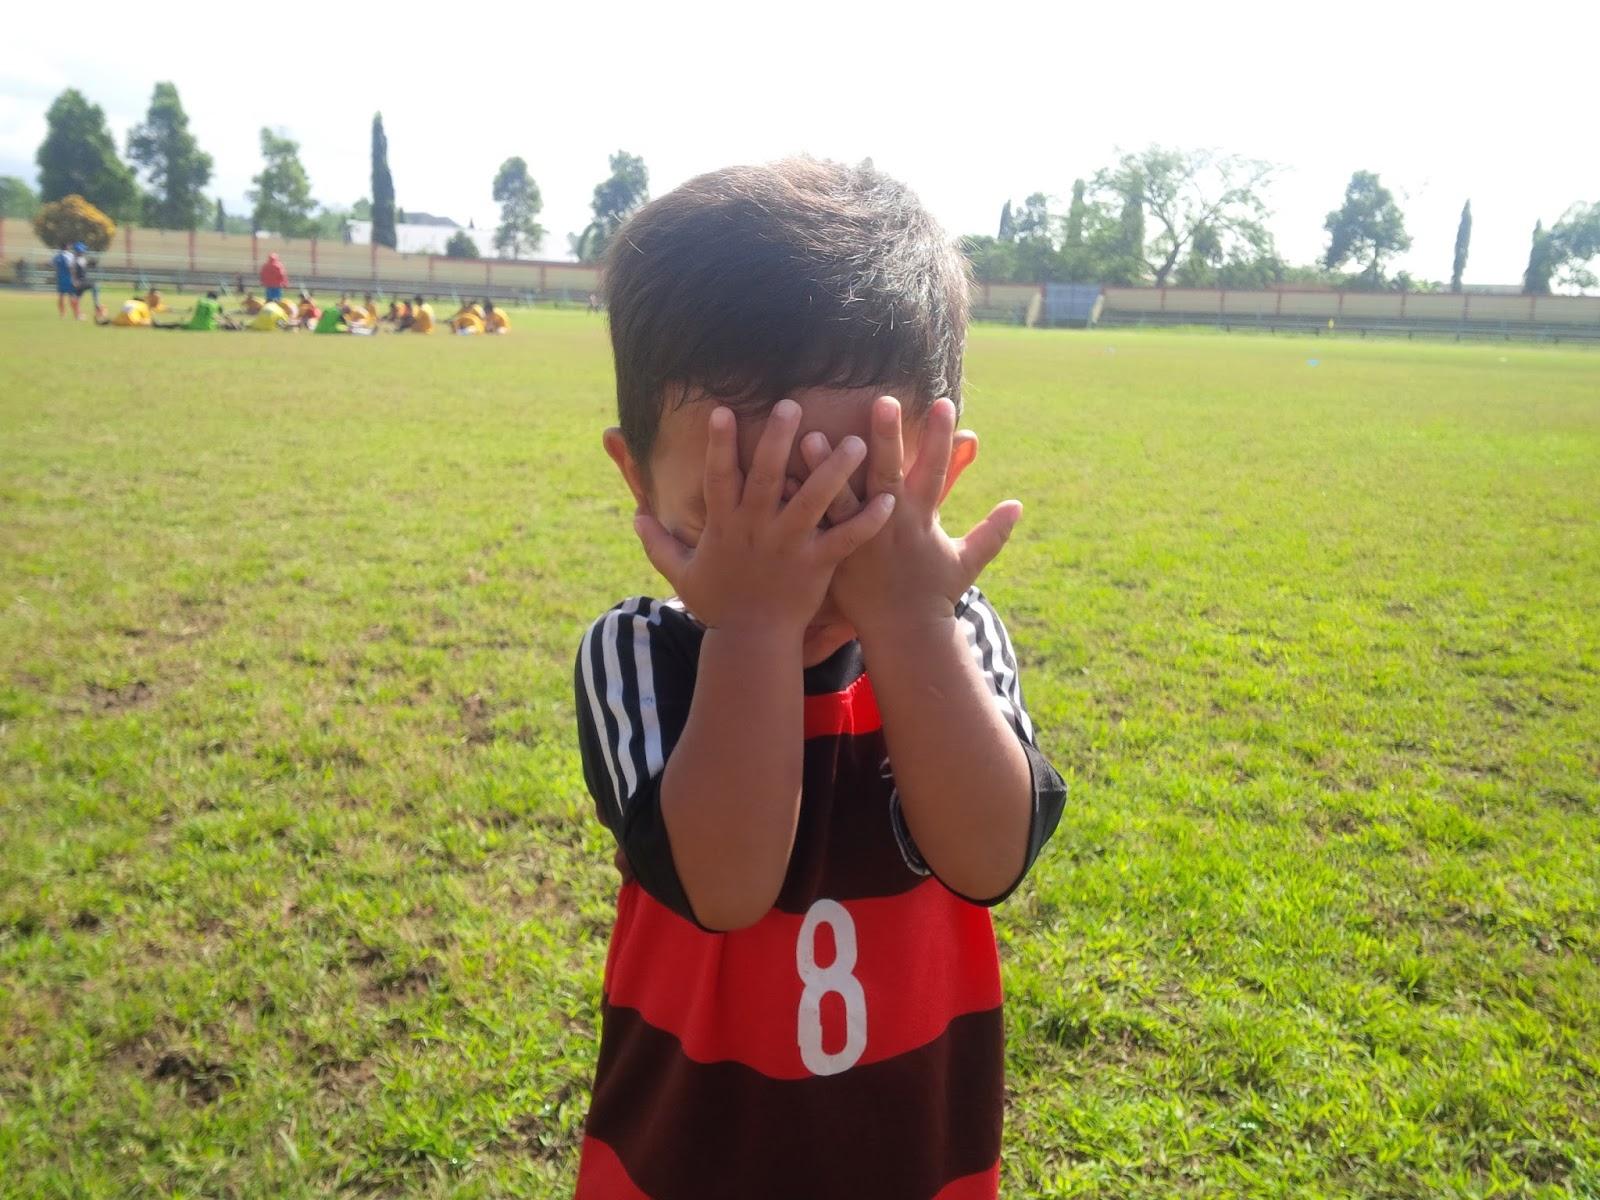 Anak Kecil Pun Mencintai Sepakbola Arsad Corner